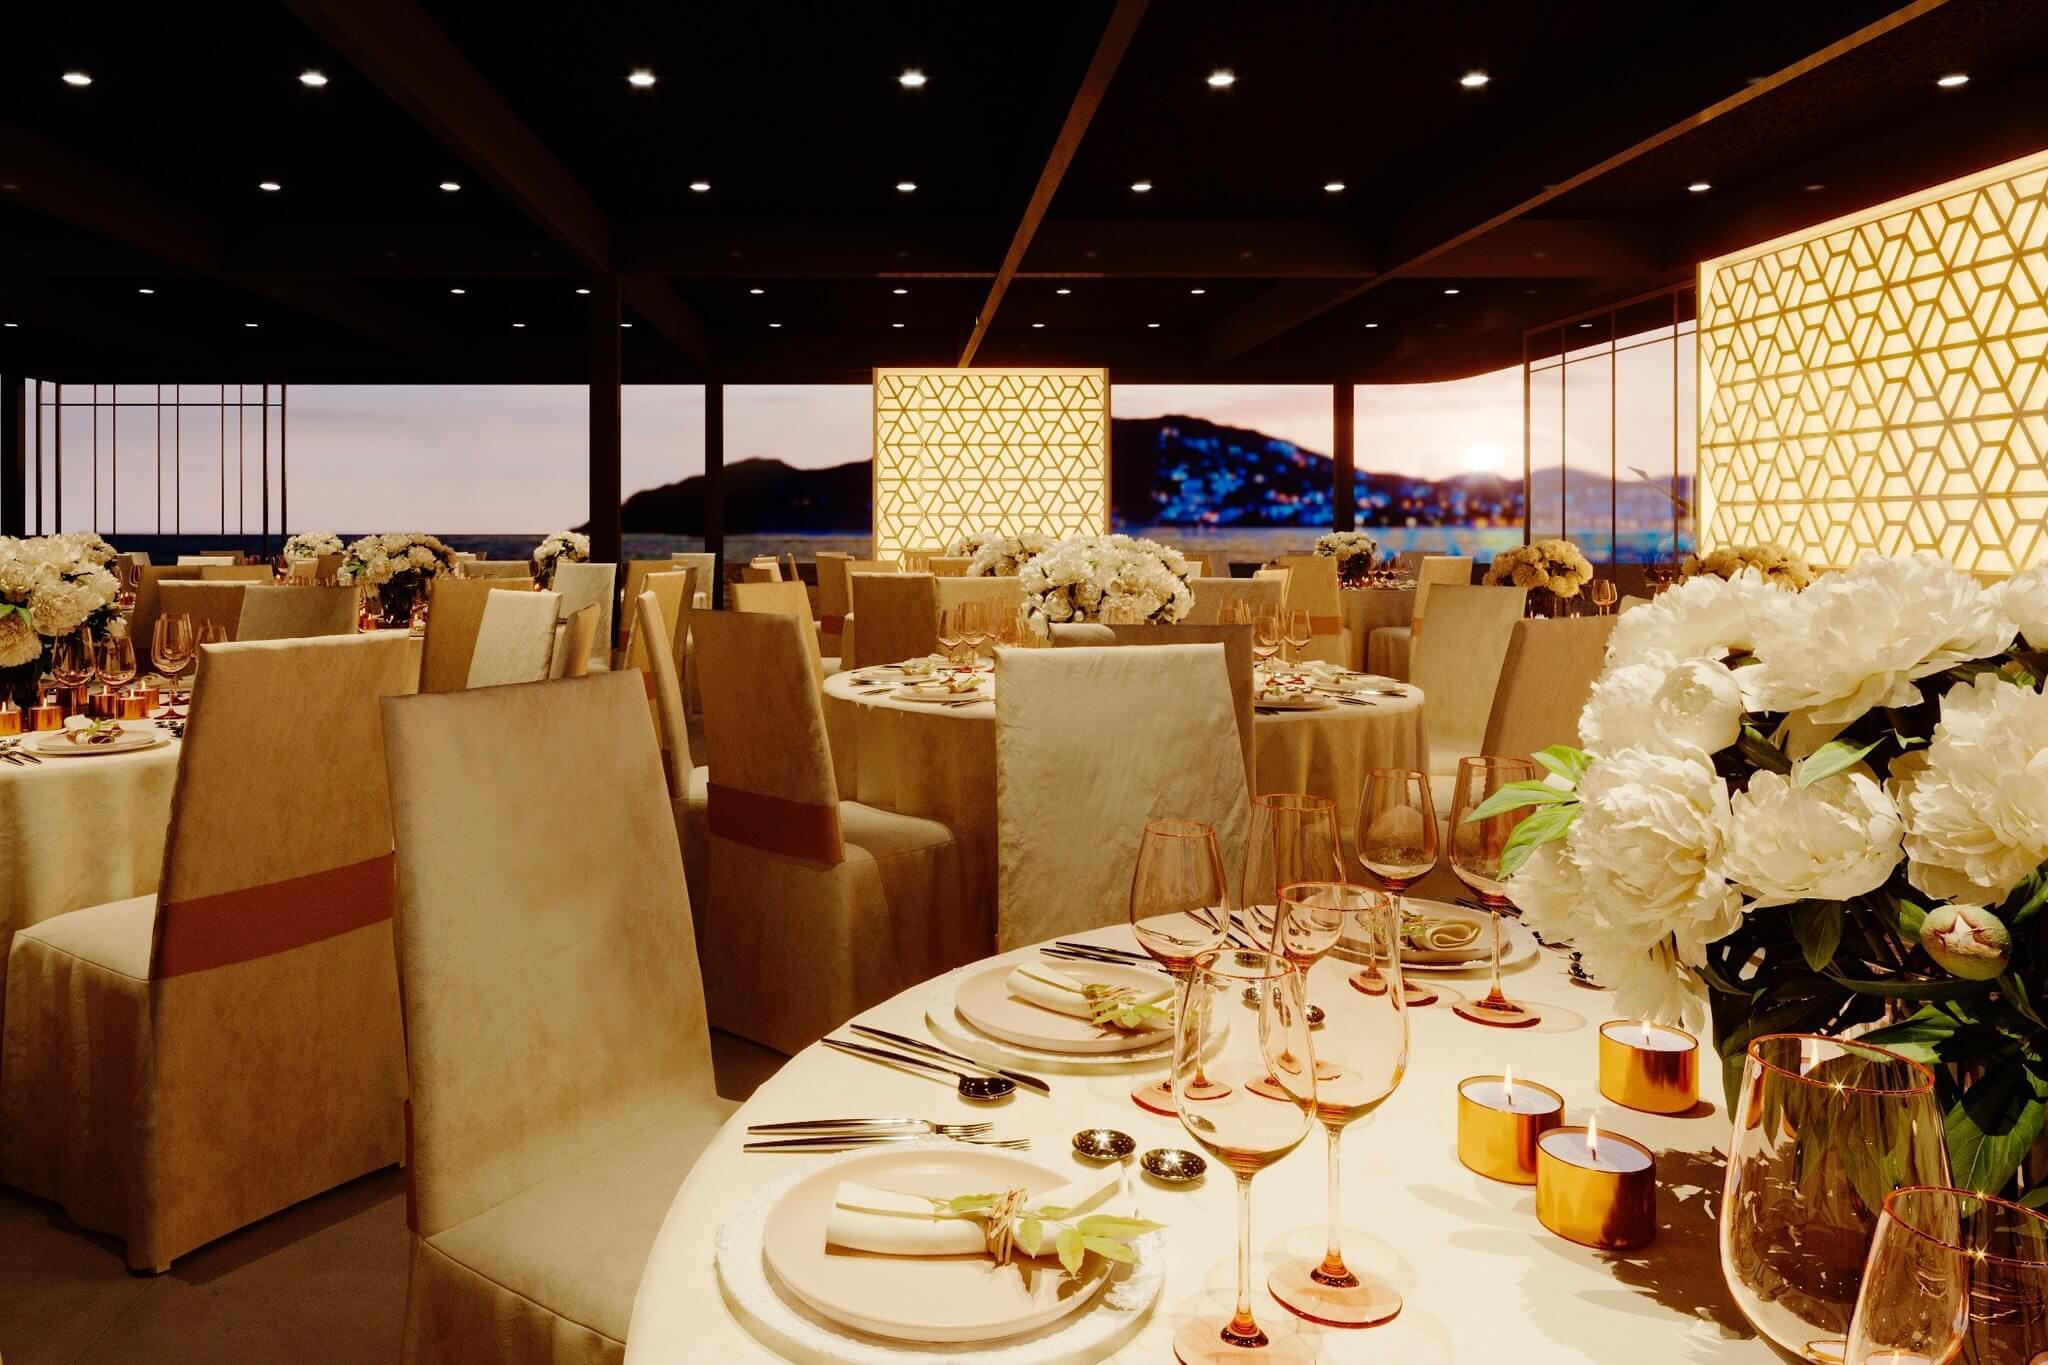 https://www.white-ibiza.com/wp-content/uploads/2020/03/ibiza-weddings-aguas-de-ibiza-2020-03.jpg